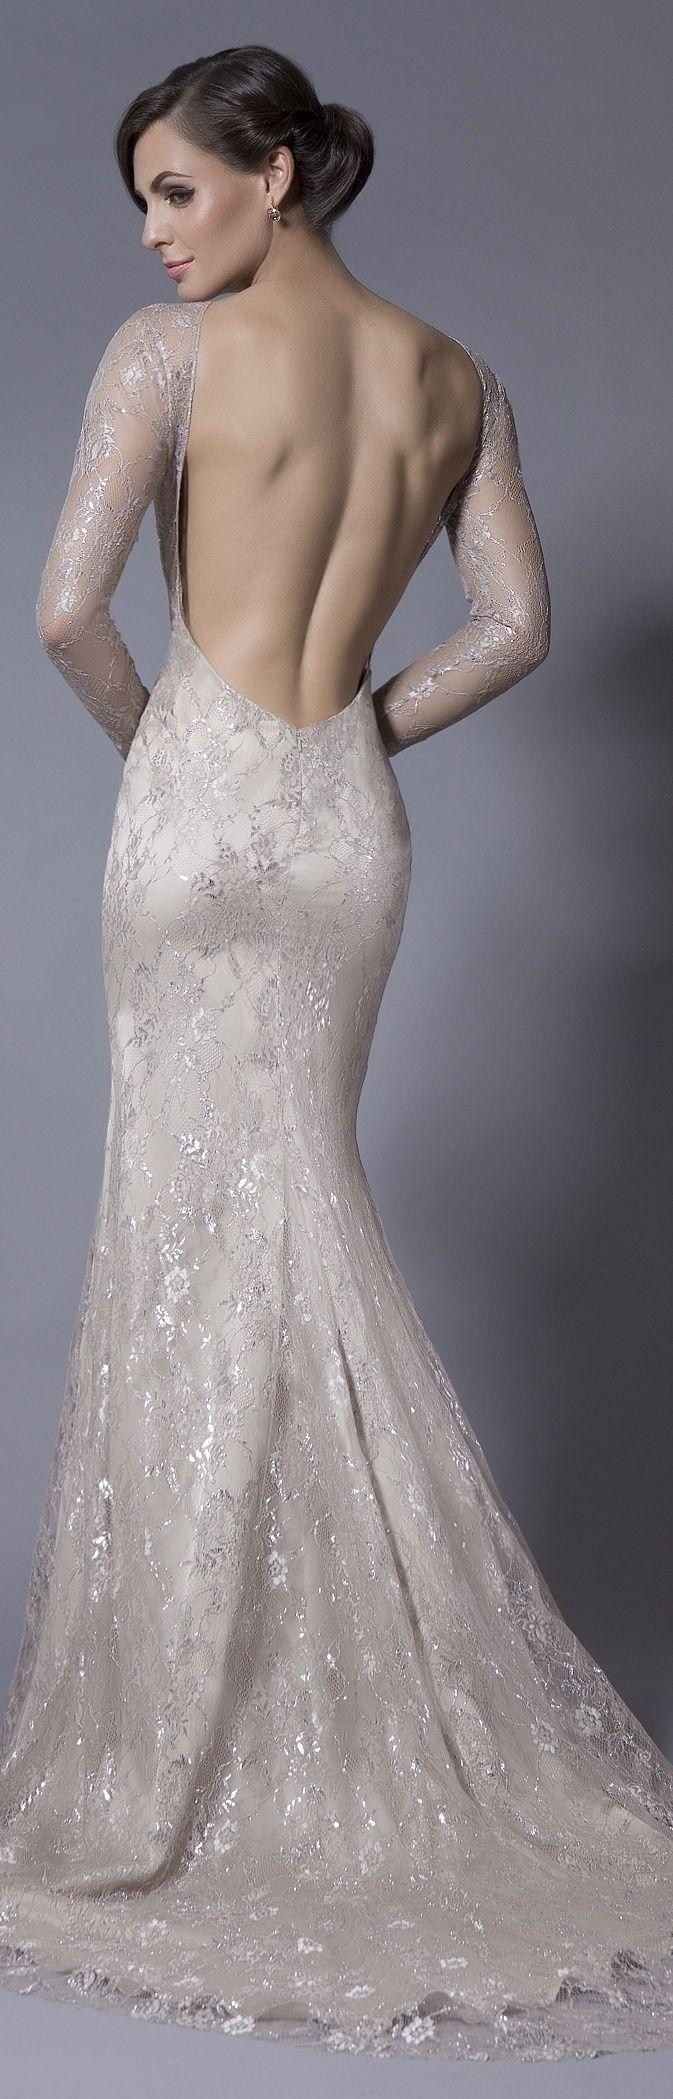 fairytale wedding dresses fairy wedding dress Fairytale Wedding Dresses